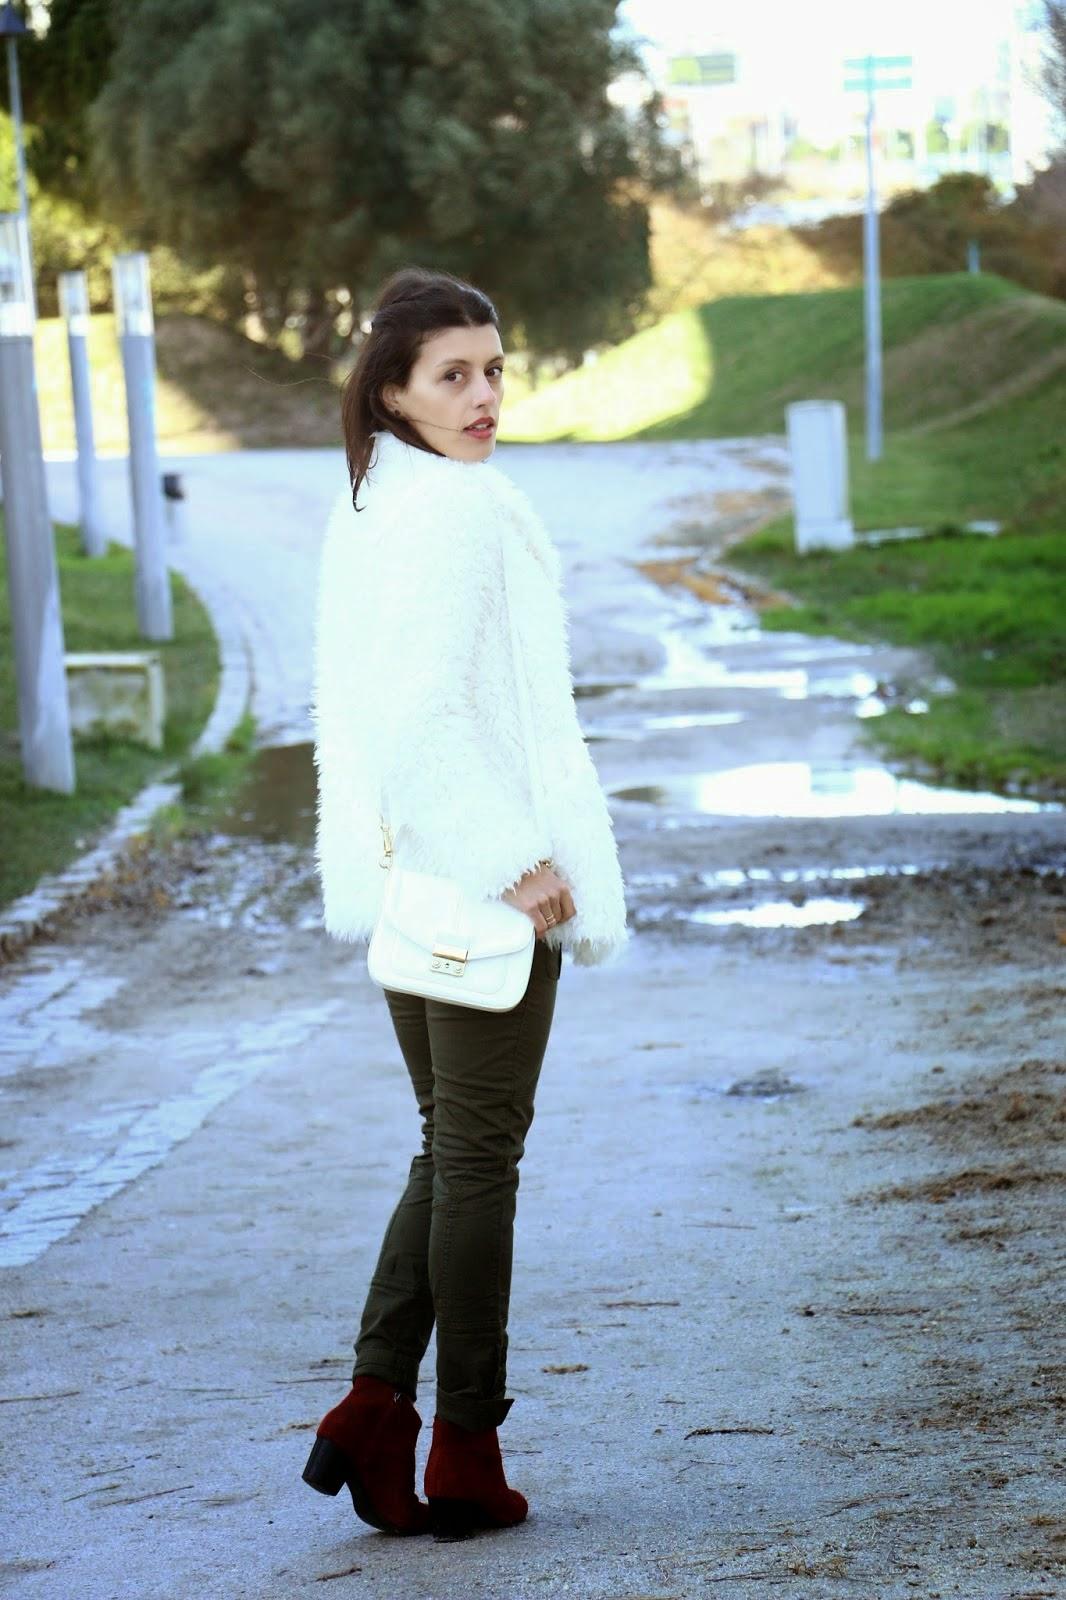 http://ilovefitametrica.blogspot.pt/2015/02/khaki-red-boots.html